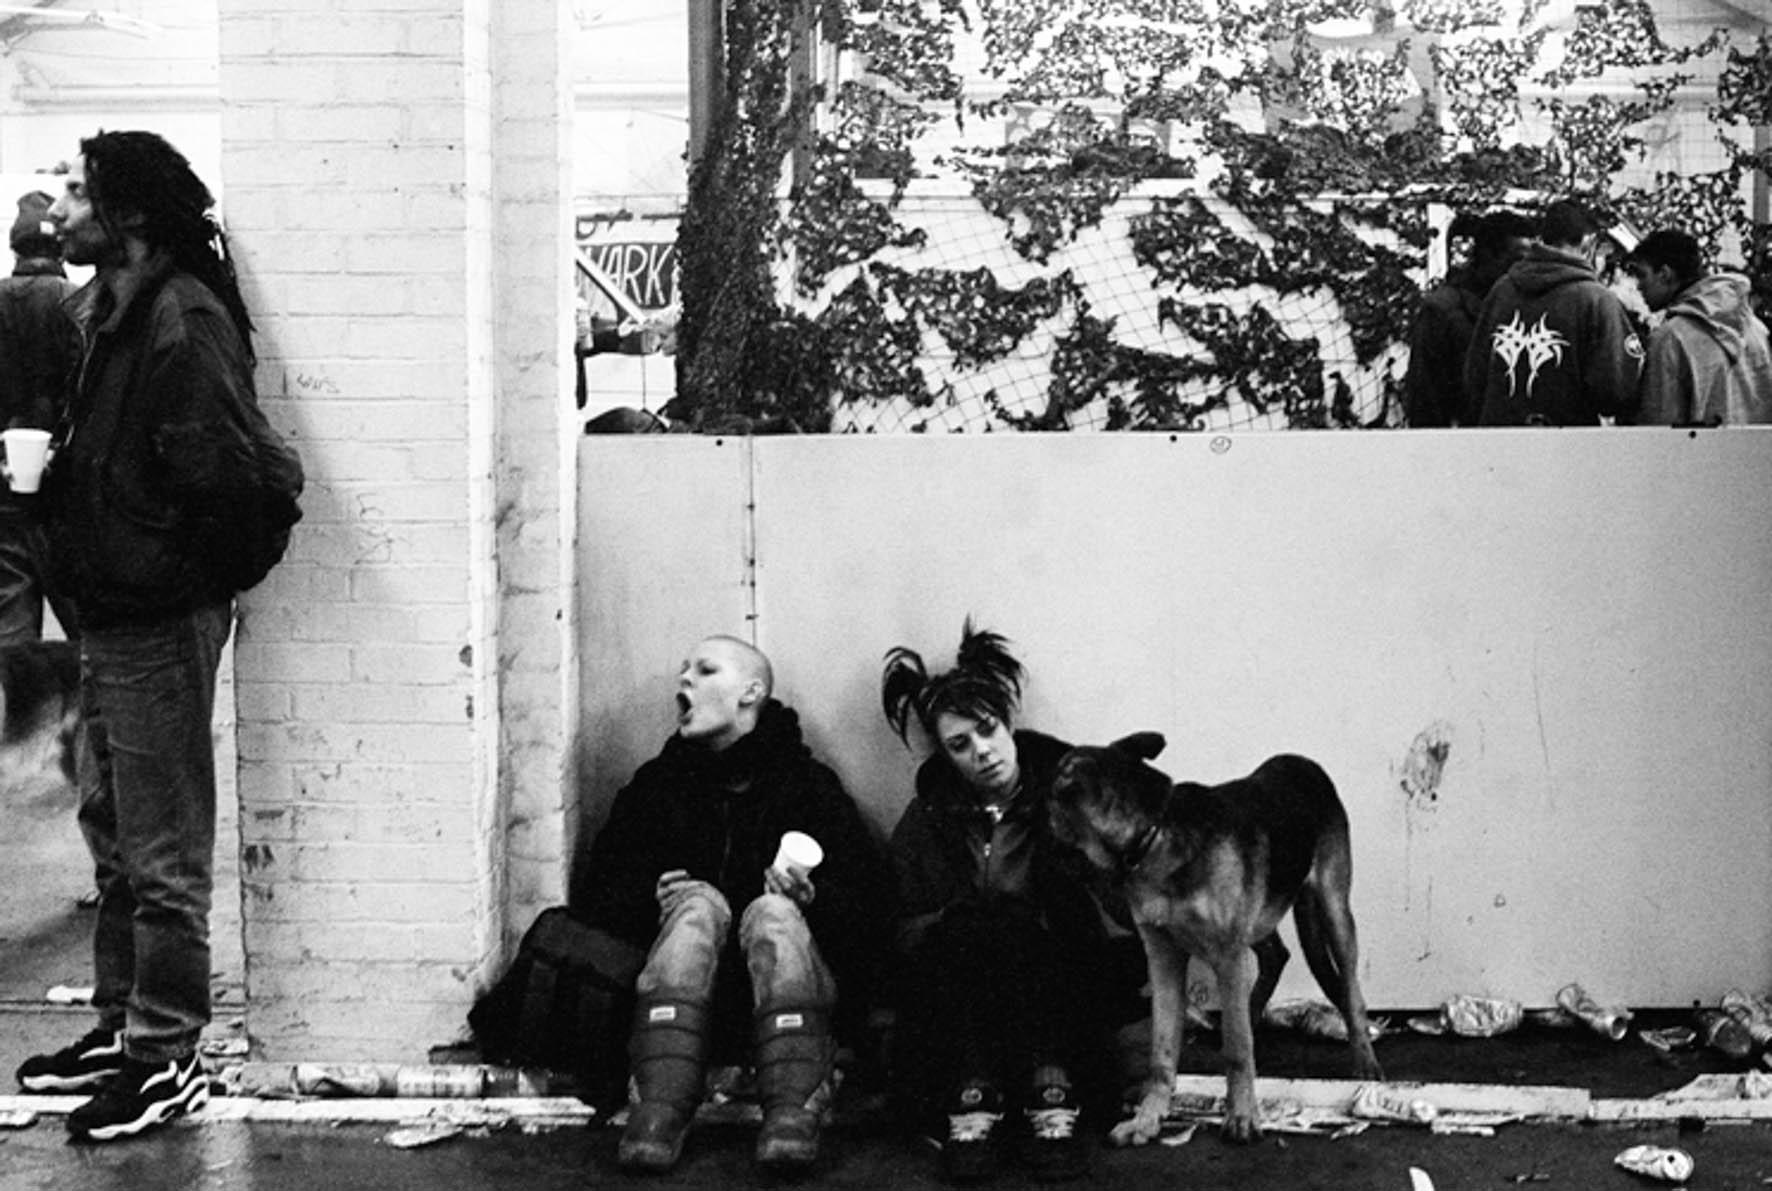 Molly Macindoe - Sally, Belinda and Knickers the dog, Acton, London, 1999